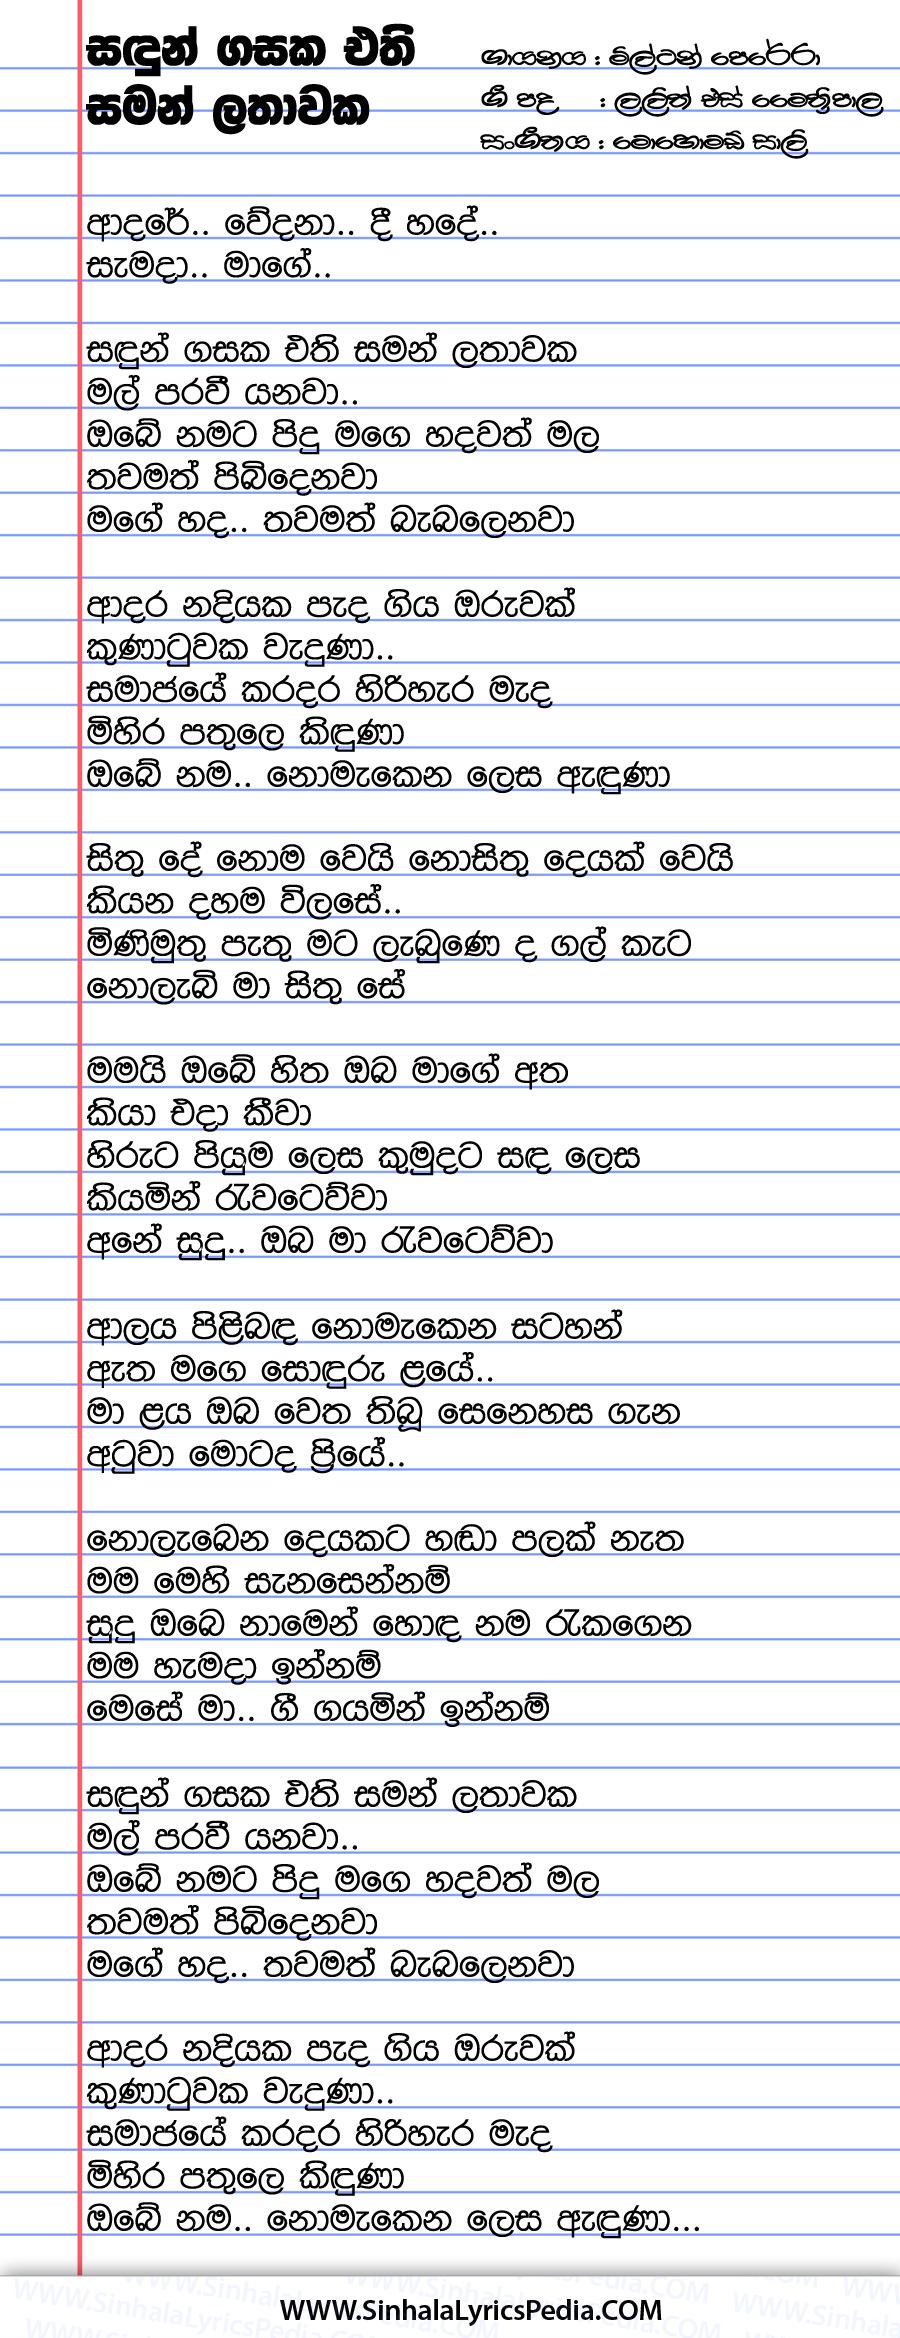 Sandun Gasaka Ethi Saman Lathawaka Song Lyrics